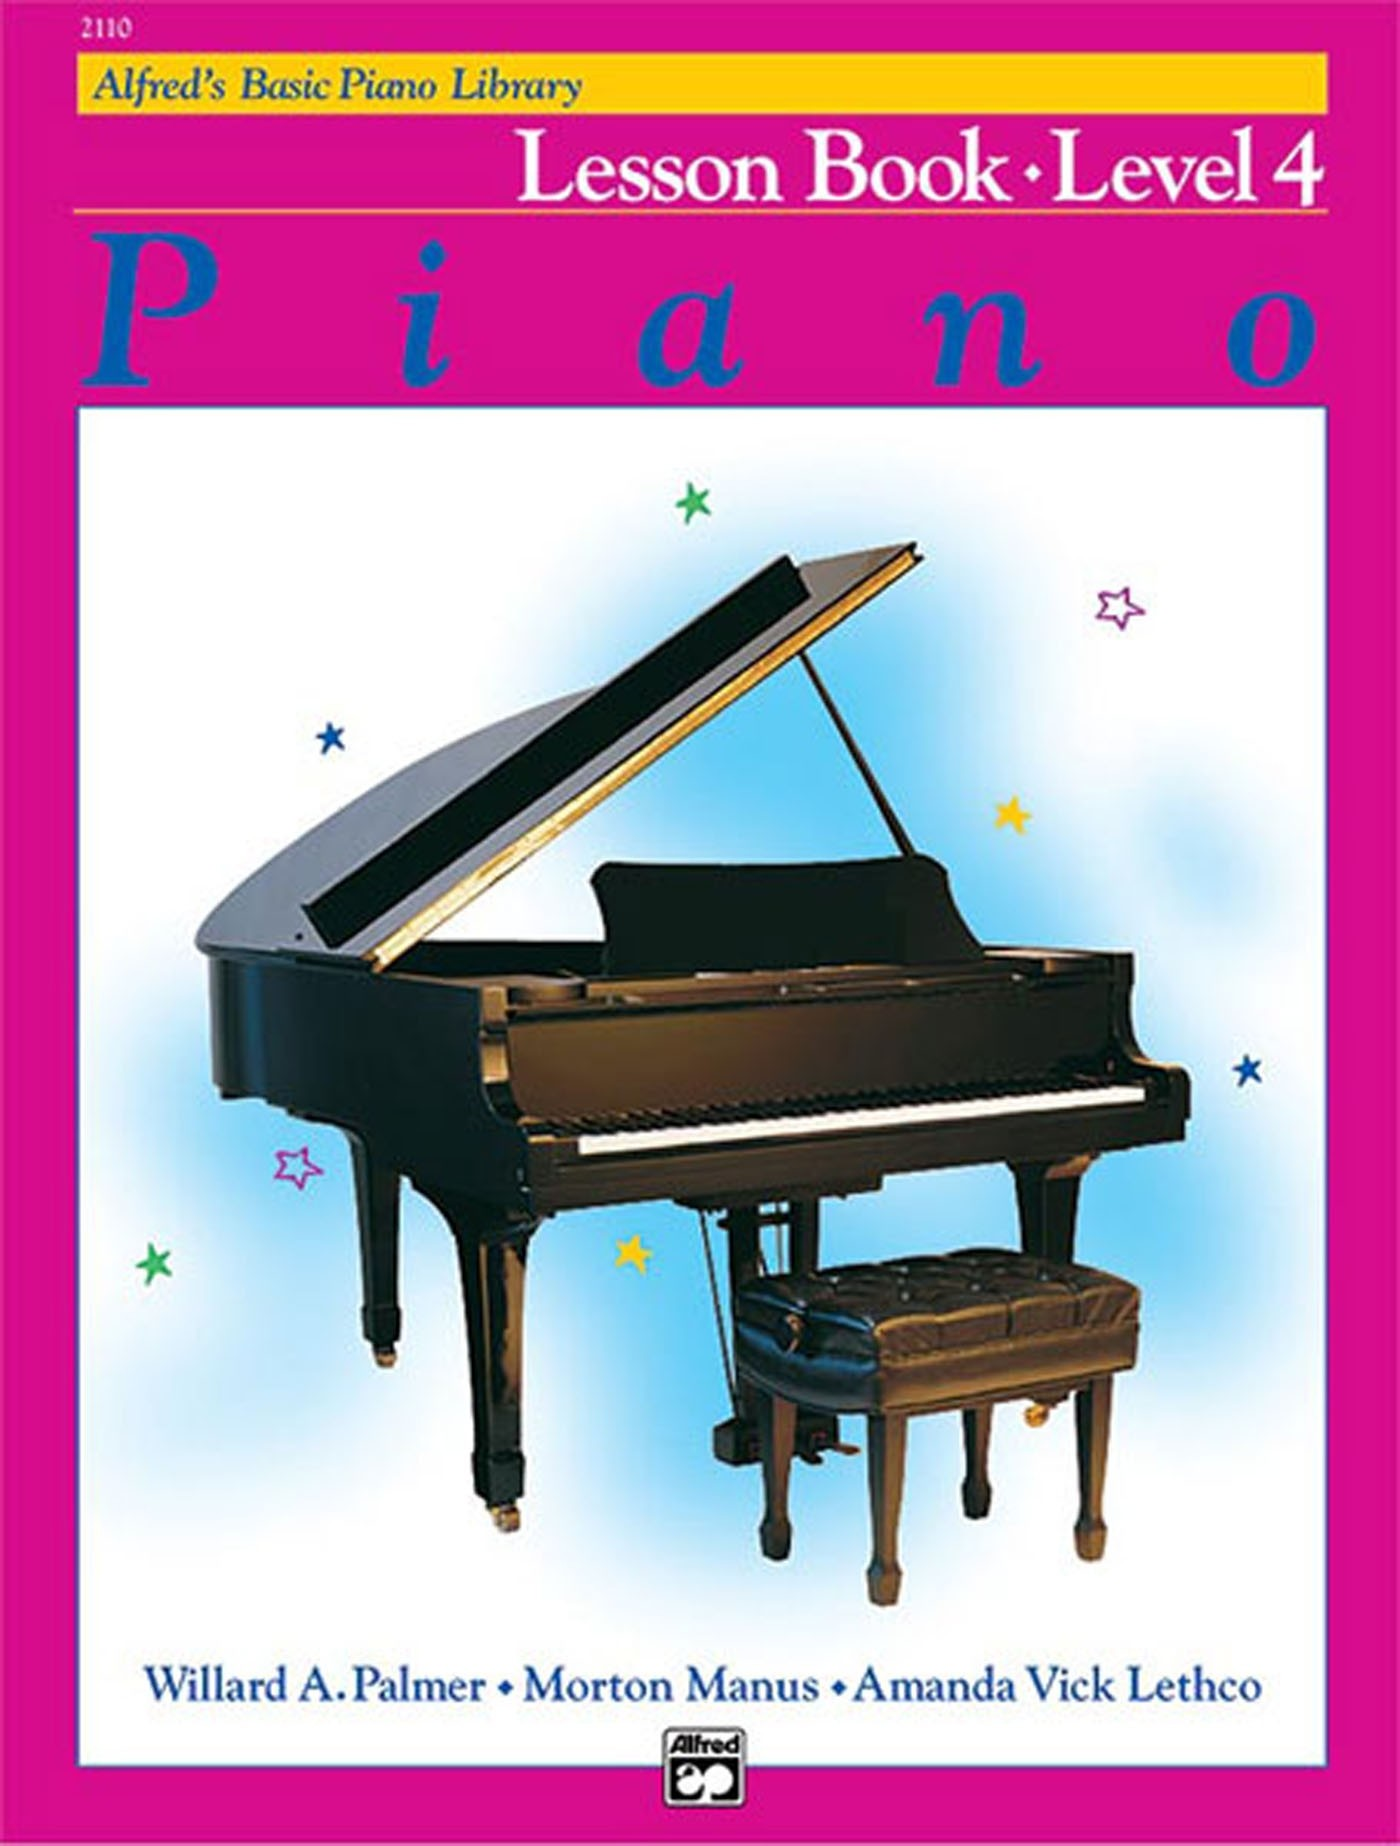 Alfred's Basic Piano Library Lesson Book Level 4 Beginner Progressive S147